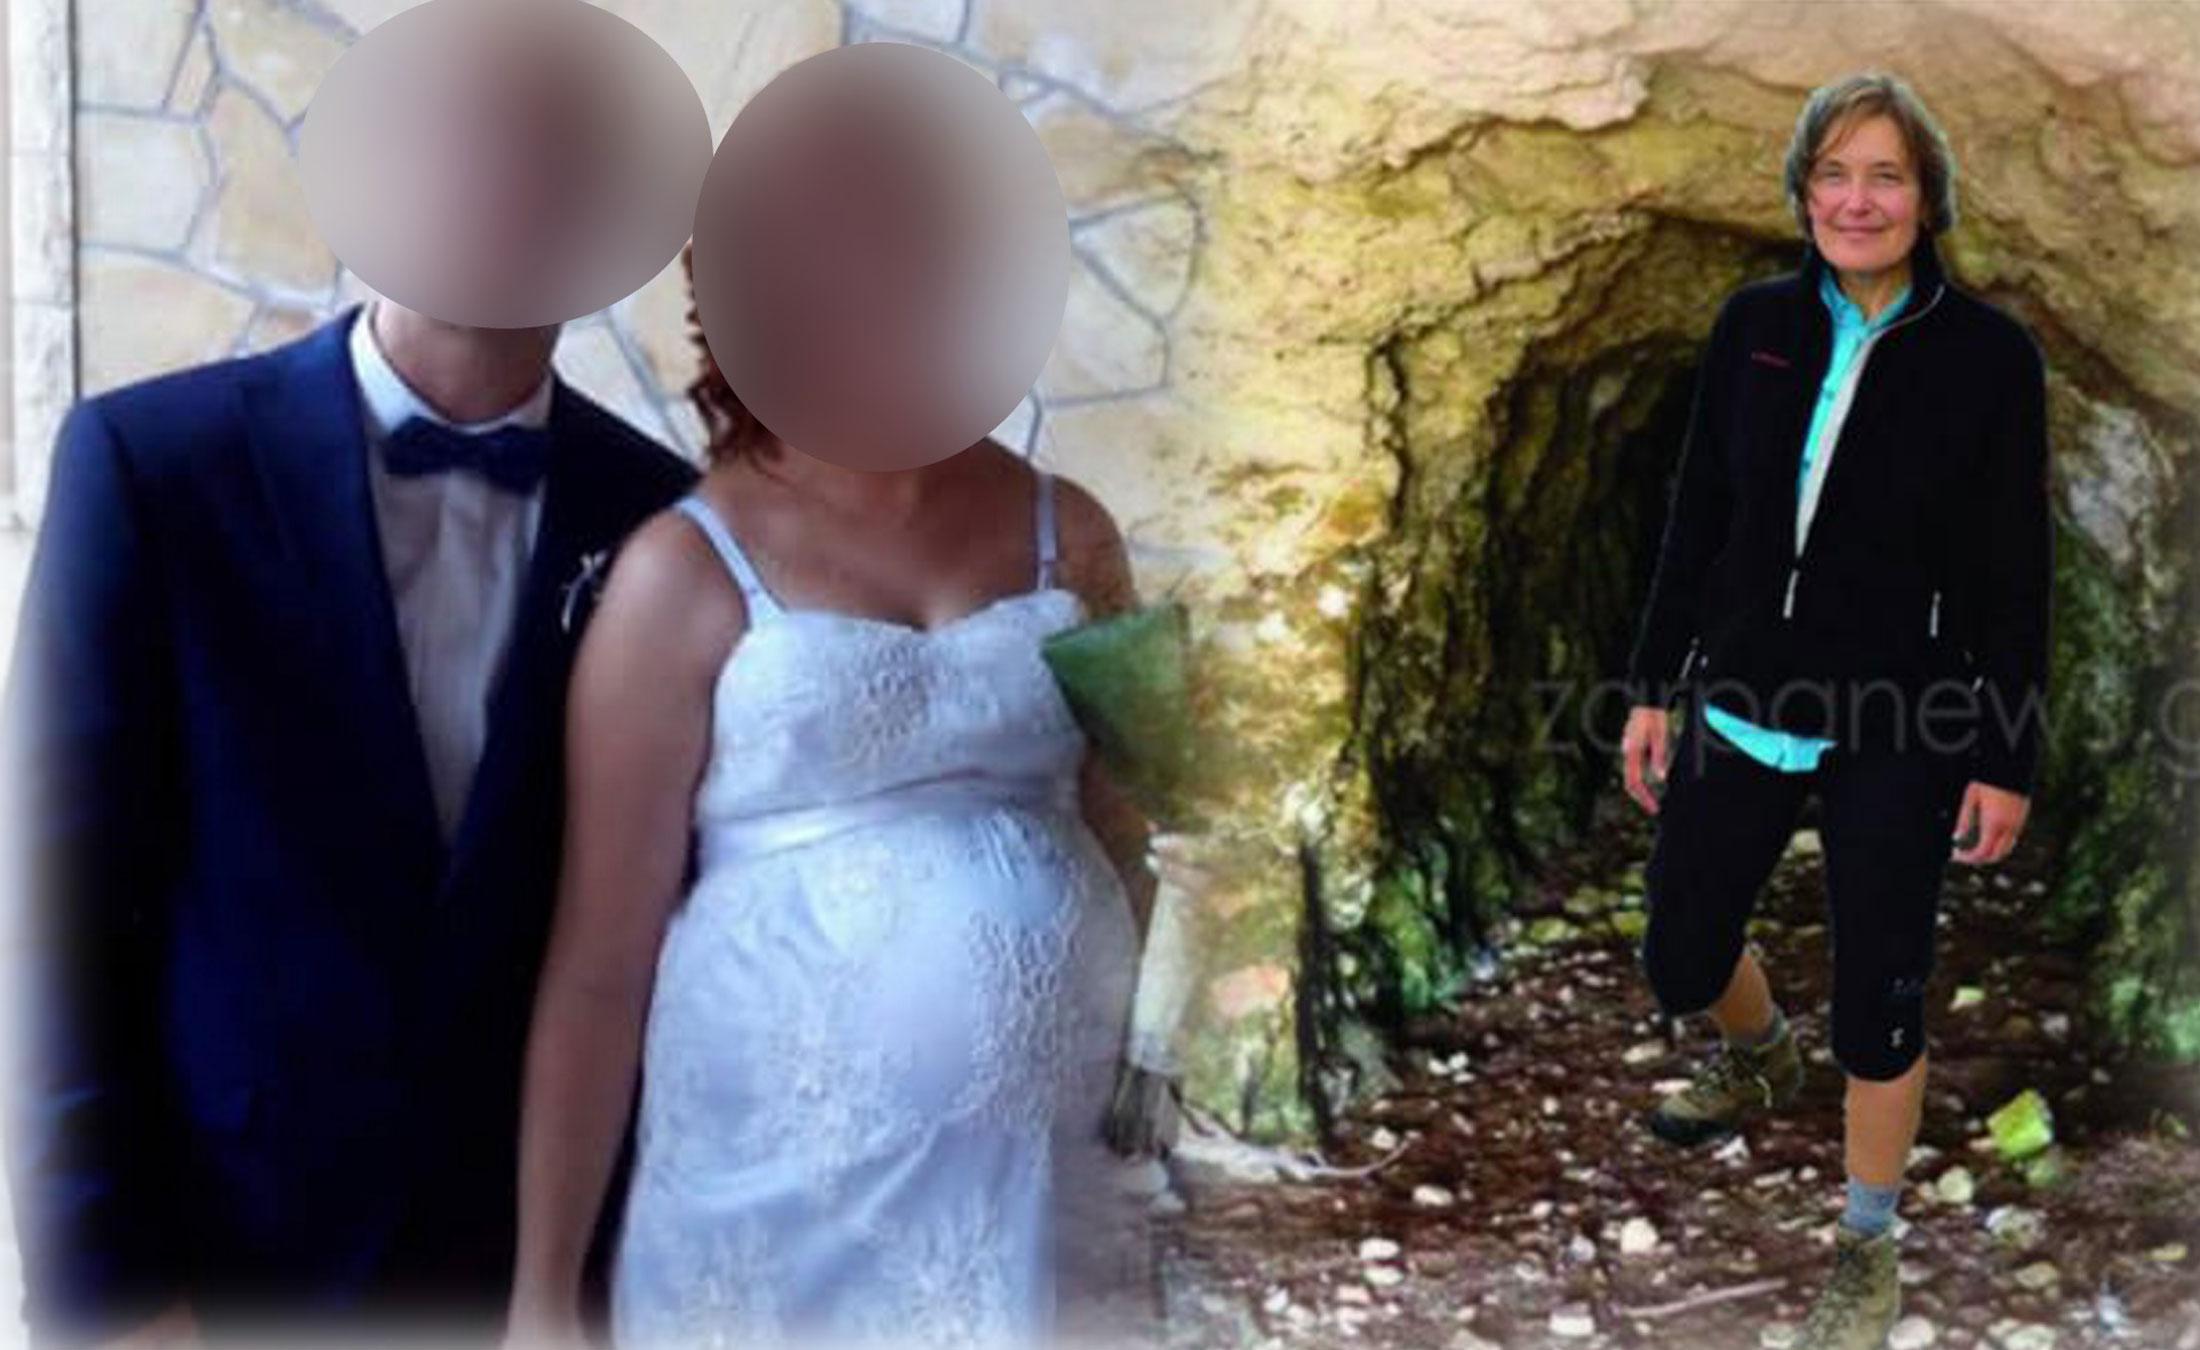 Suzanne Eaton: Ο δολοφόνος ομολόγησε πρώτα στη γυναίκα του – Η τραγική ειρωνεία στο φοβερό έγκλημα!